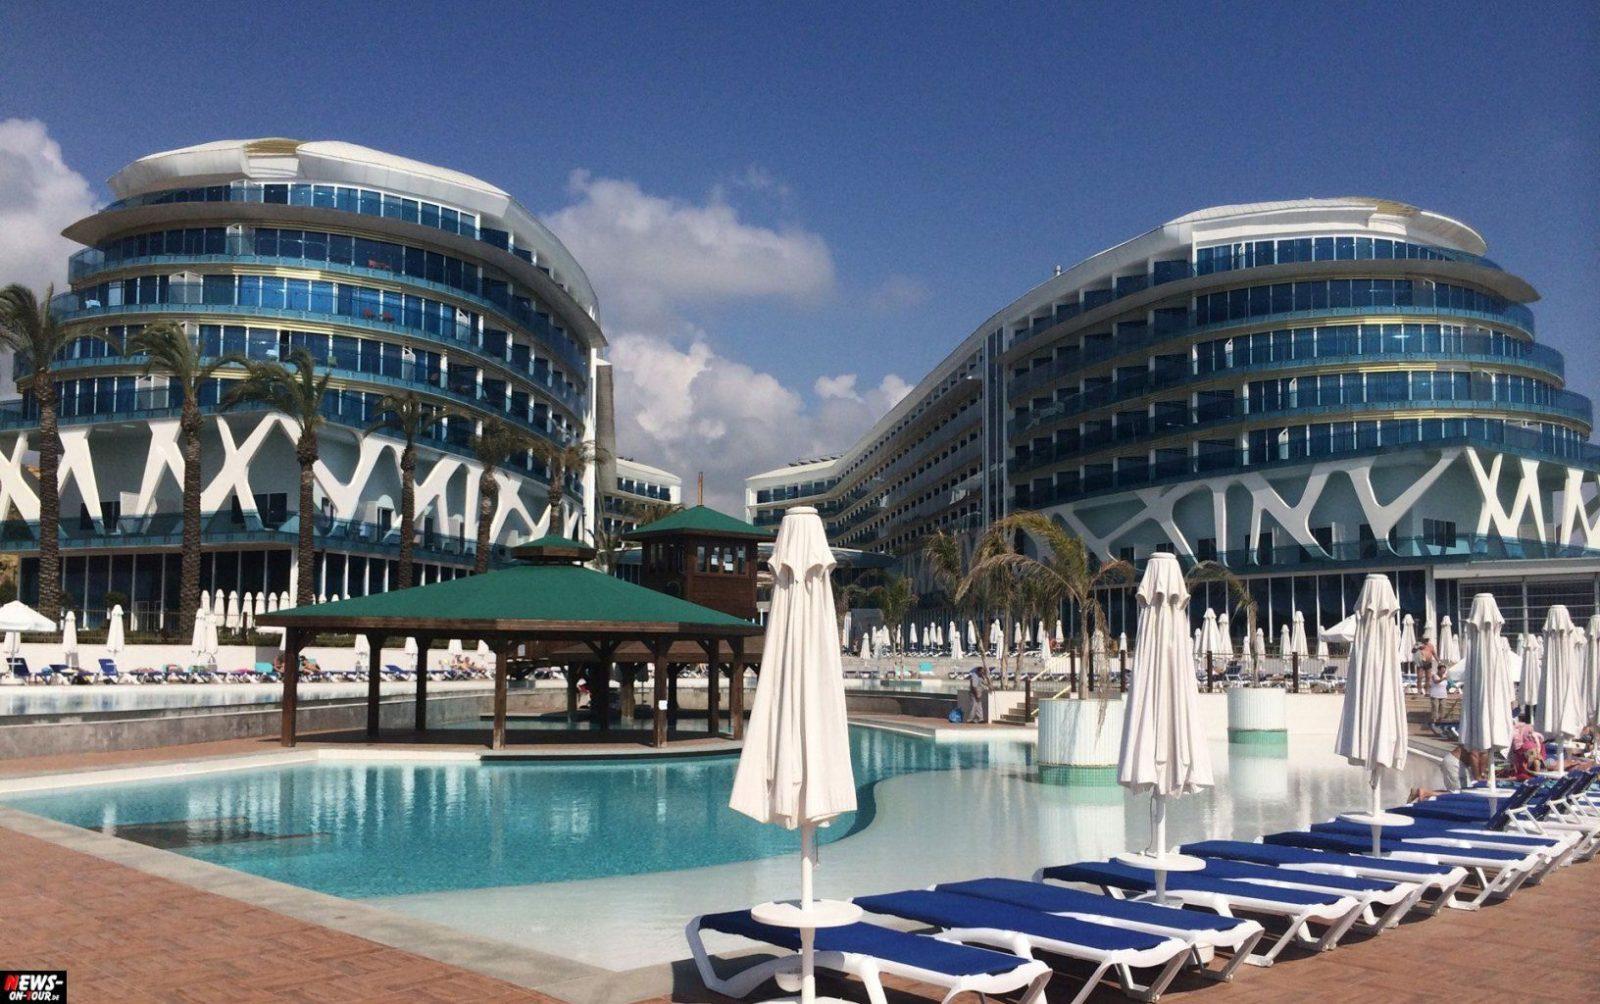 Vikingen Infinity Resort Spa  Hotelroomsearch von Vikingen Infinity Resort & Spa Bilder Bild